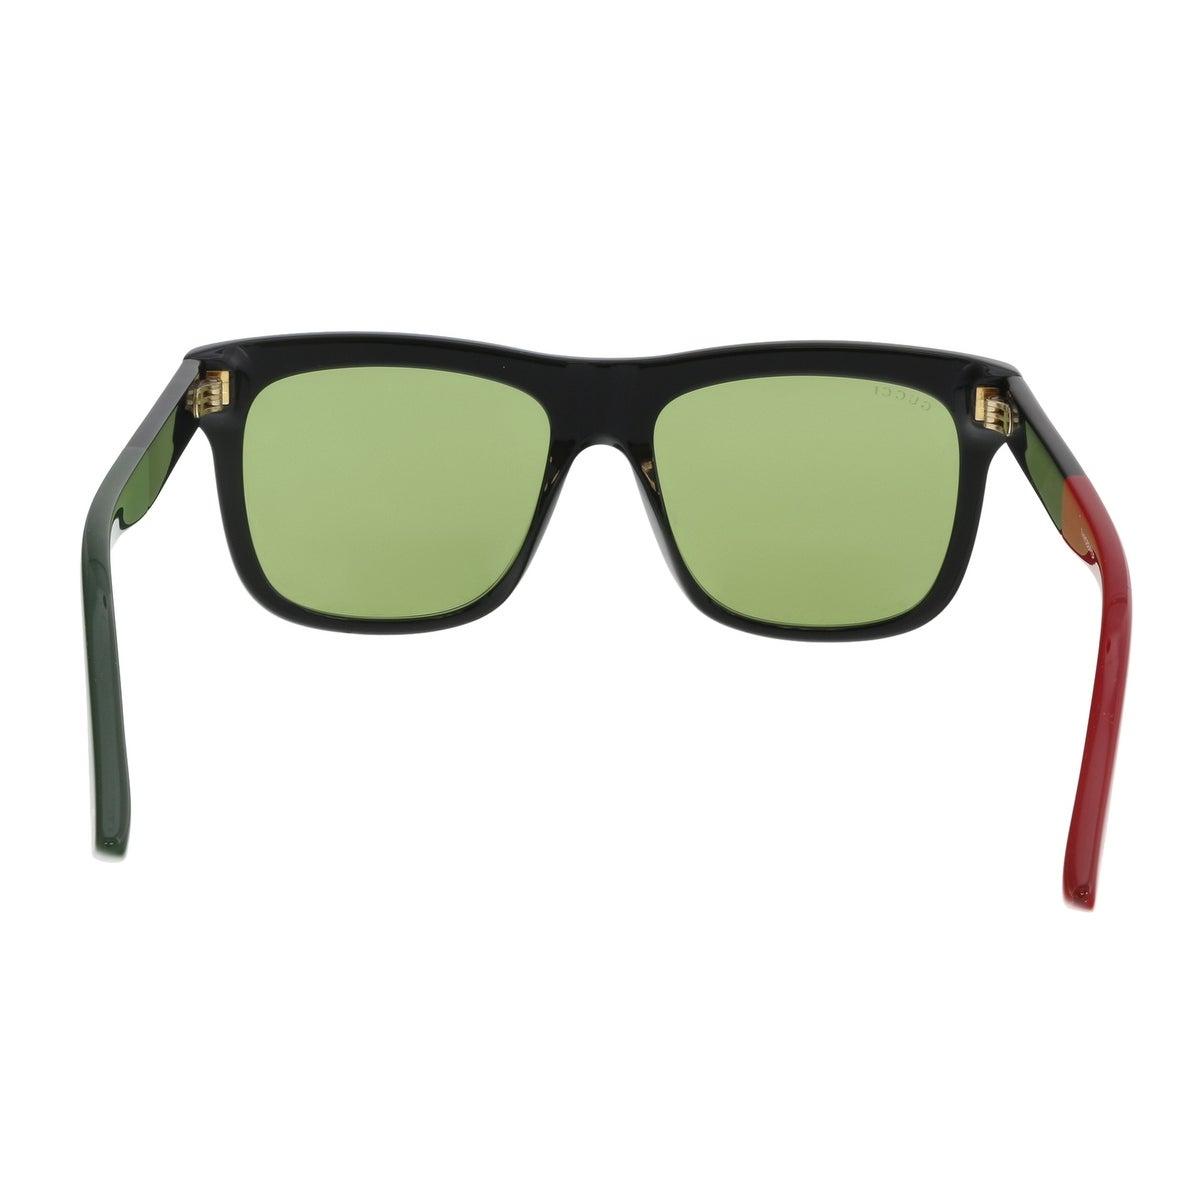 d8047e998c6 Shop Gucci GG0158S-004 Black Green Square Sunglasses - 54-17-145 - Free  Shipping Today - Overstock - 19490344